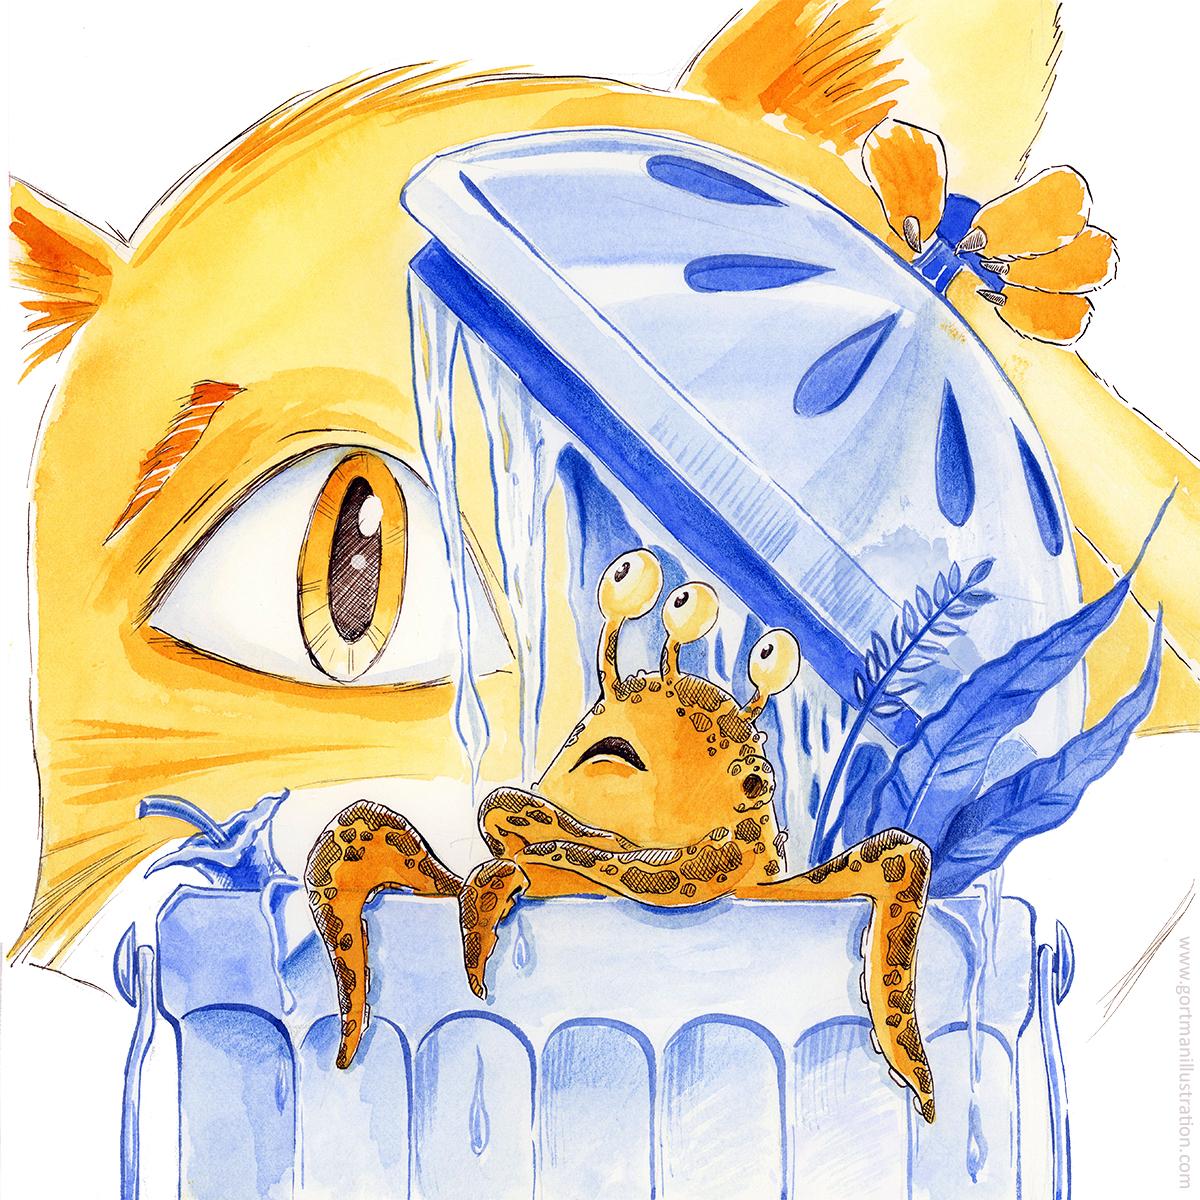 gortmanillustration---inktober---006--SCRAPS---web-1200x1200.jpg